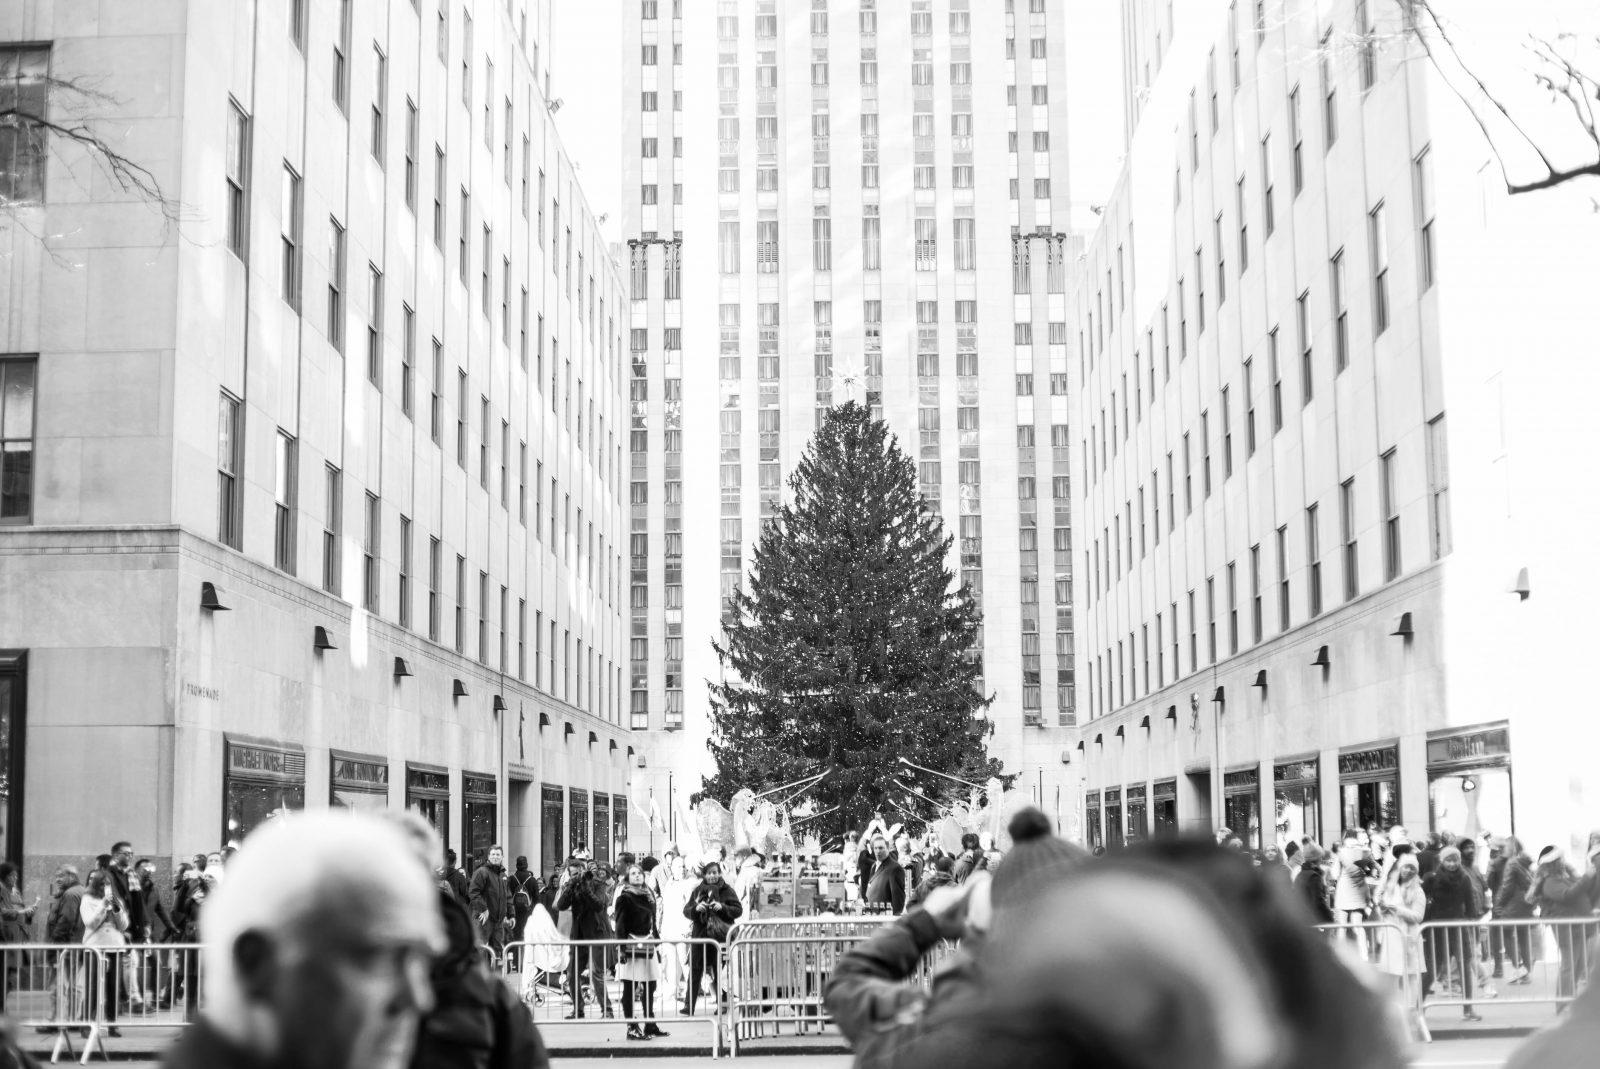 5drkoytcwx8 - Rockefeller Center